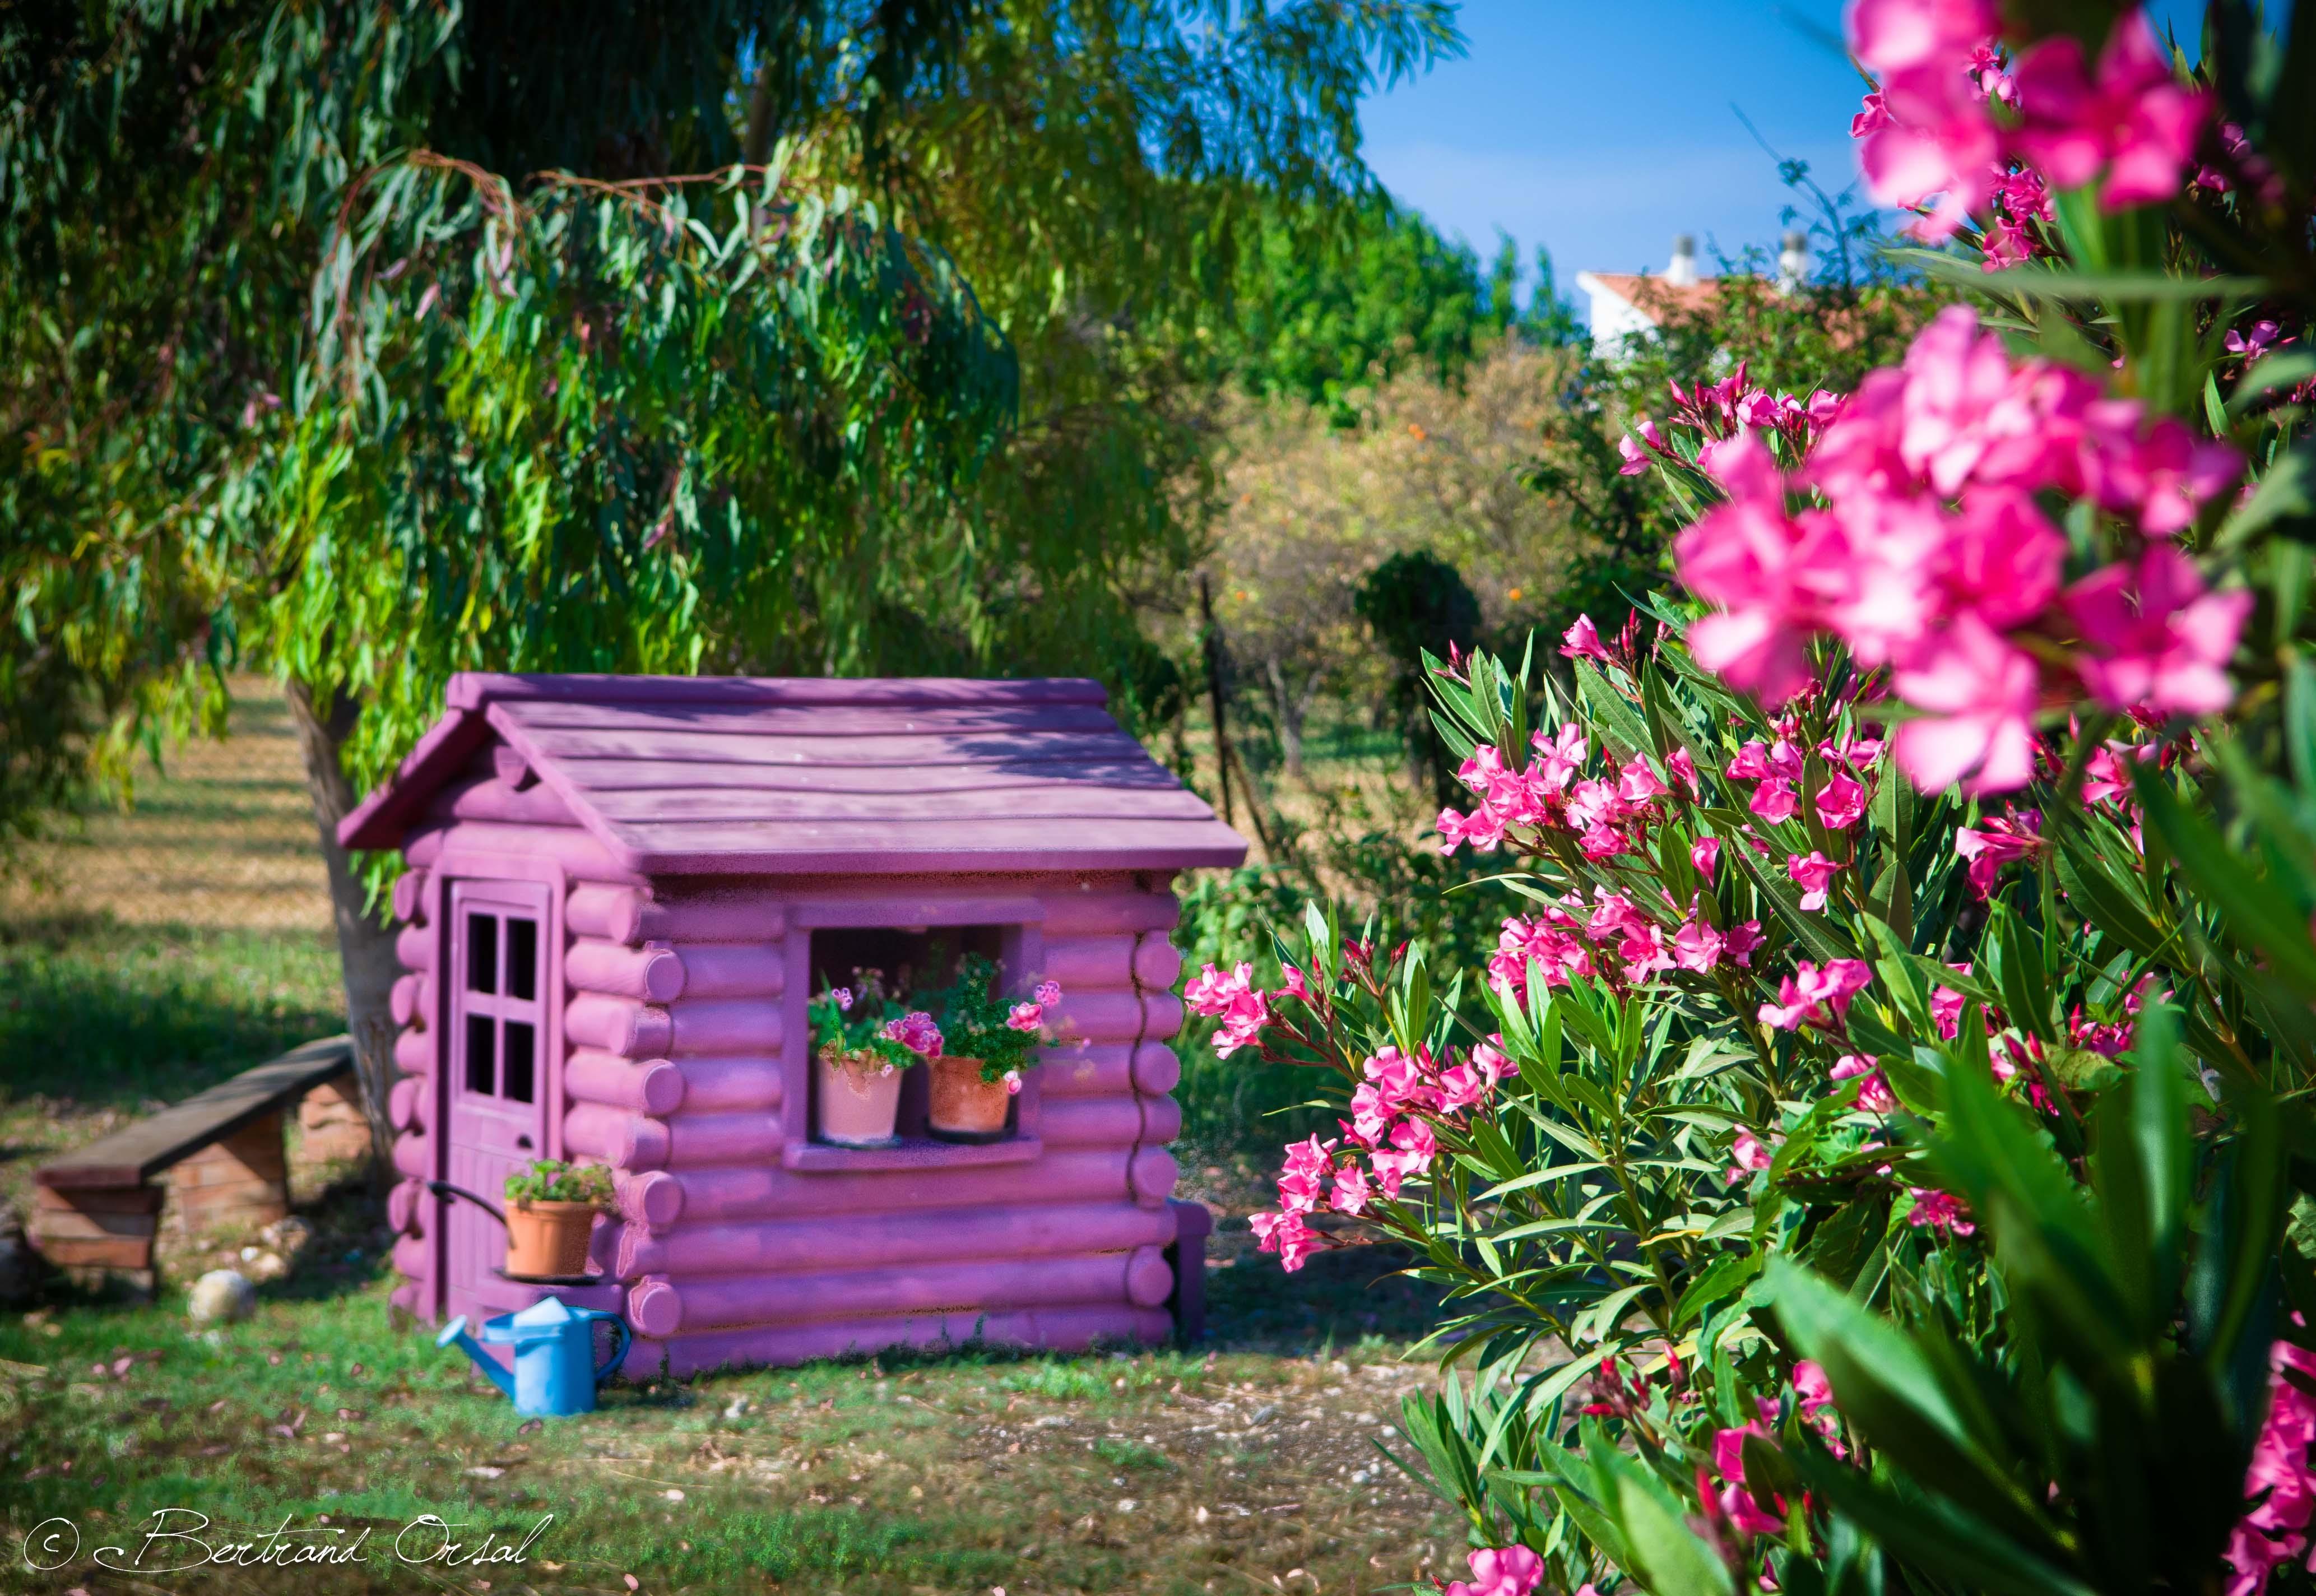 beautiful idee de jardin fleuri 11 comment transformer son balcon en petit jardin homeezy. Black Bedroom Furniture Sets. Home Design Ideas